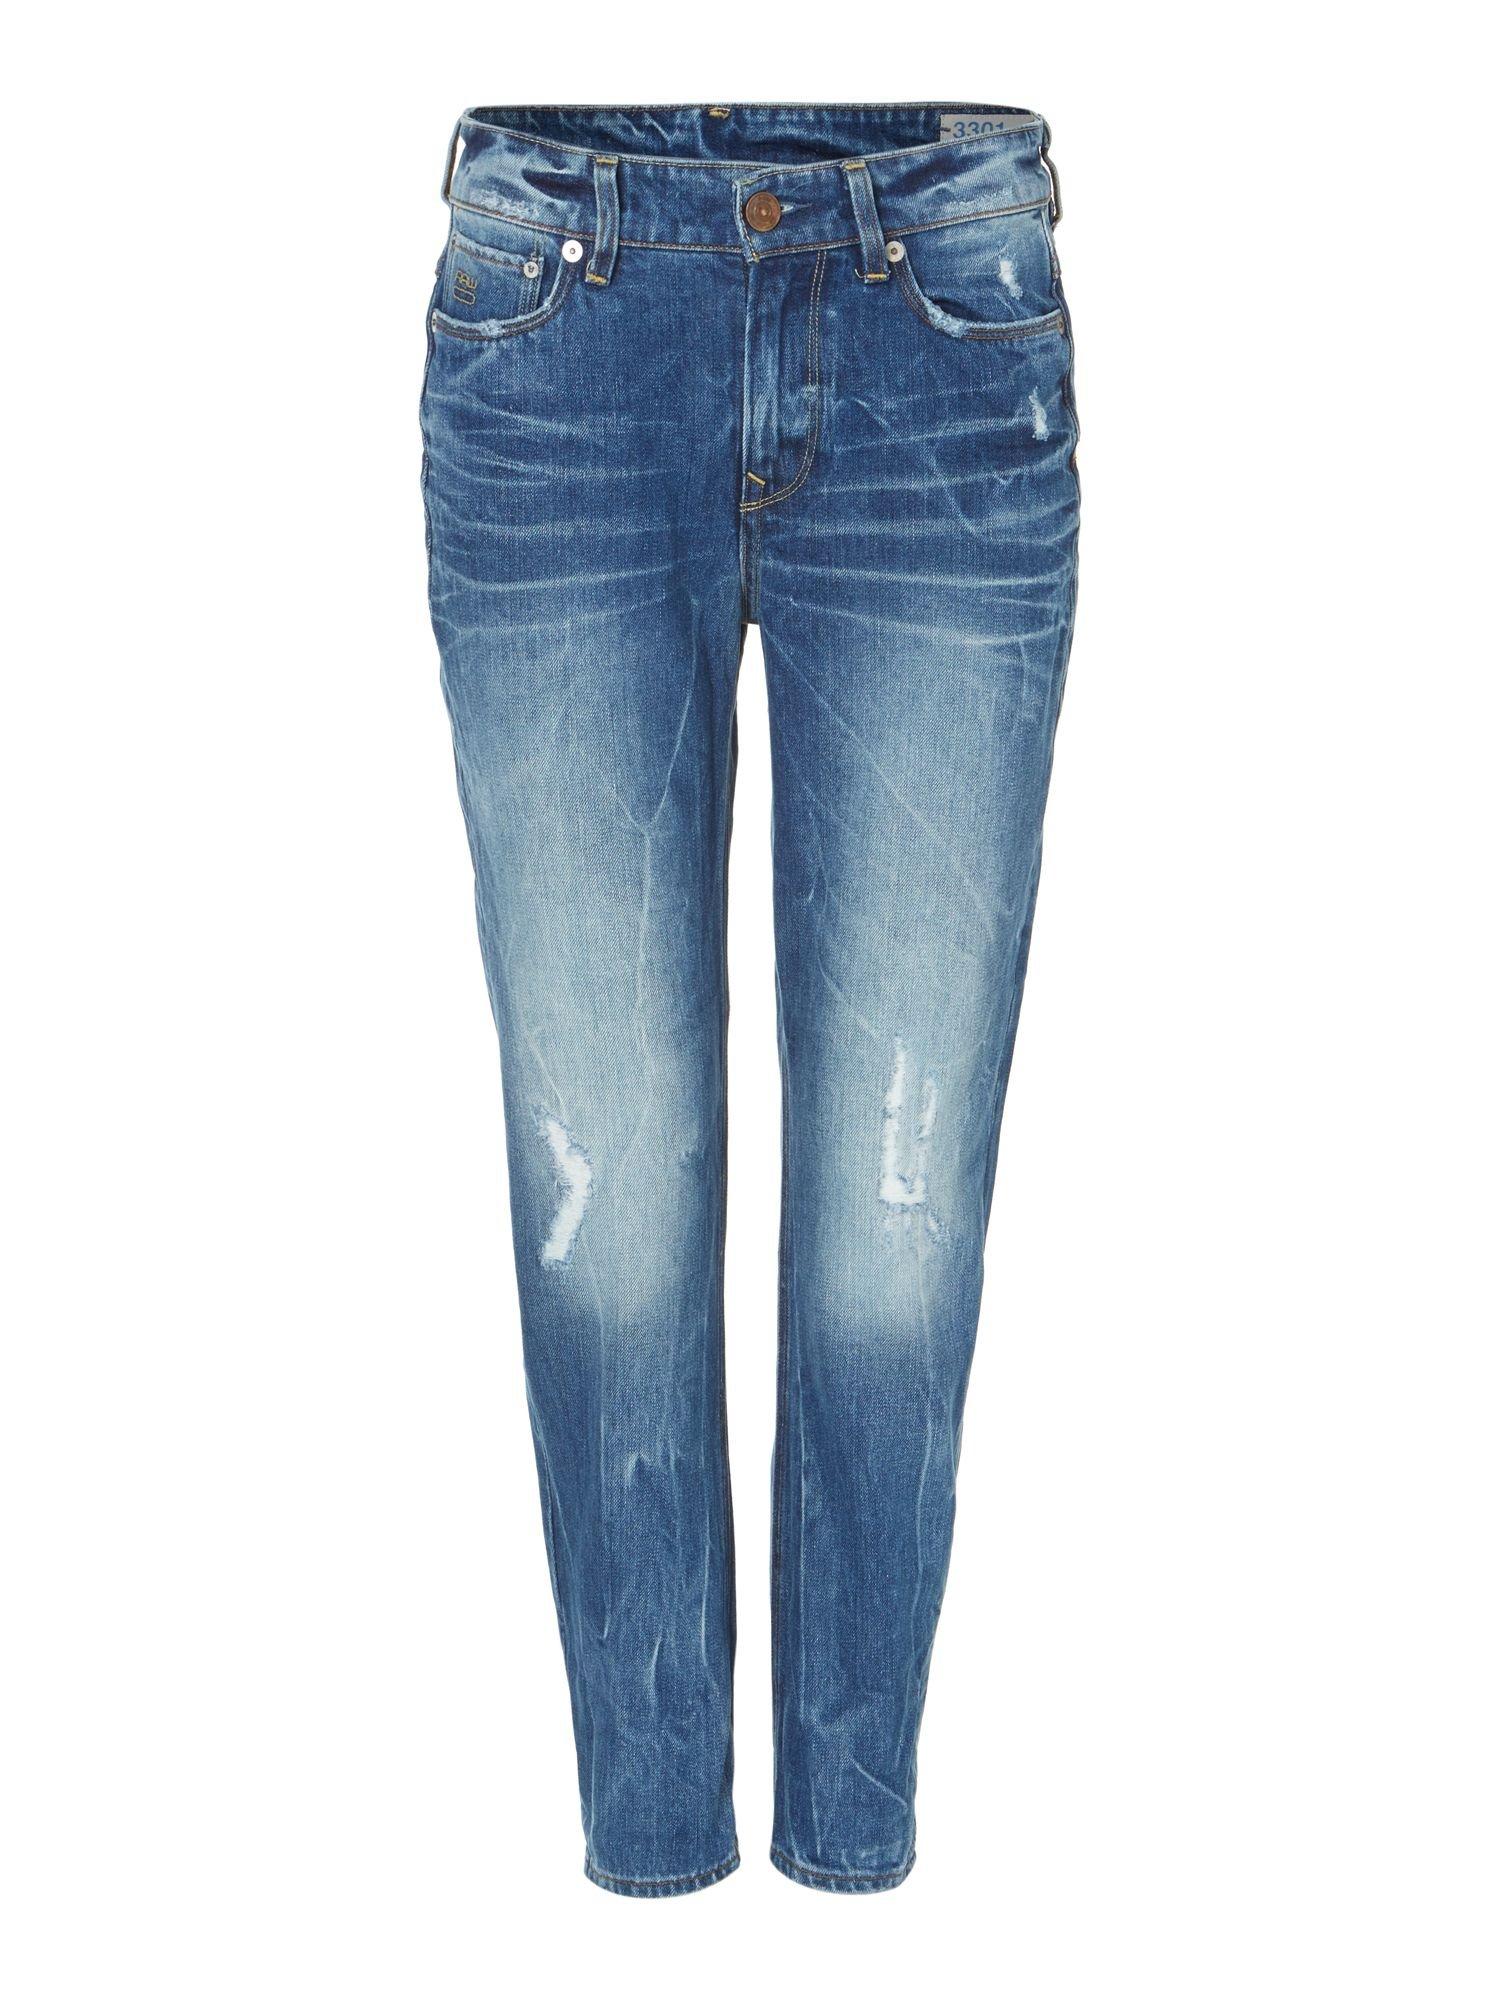 g star raw g star 3301 boyfriend jeans in blue lyst. Black Bedroom Furniture Sets. Home Design Ideas